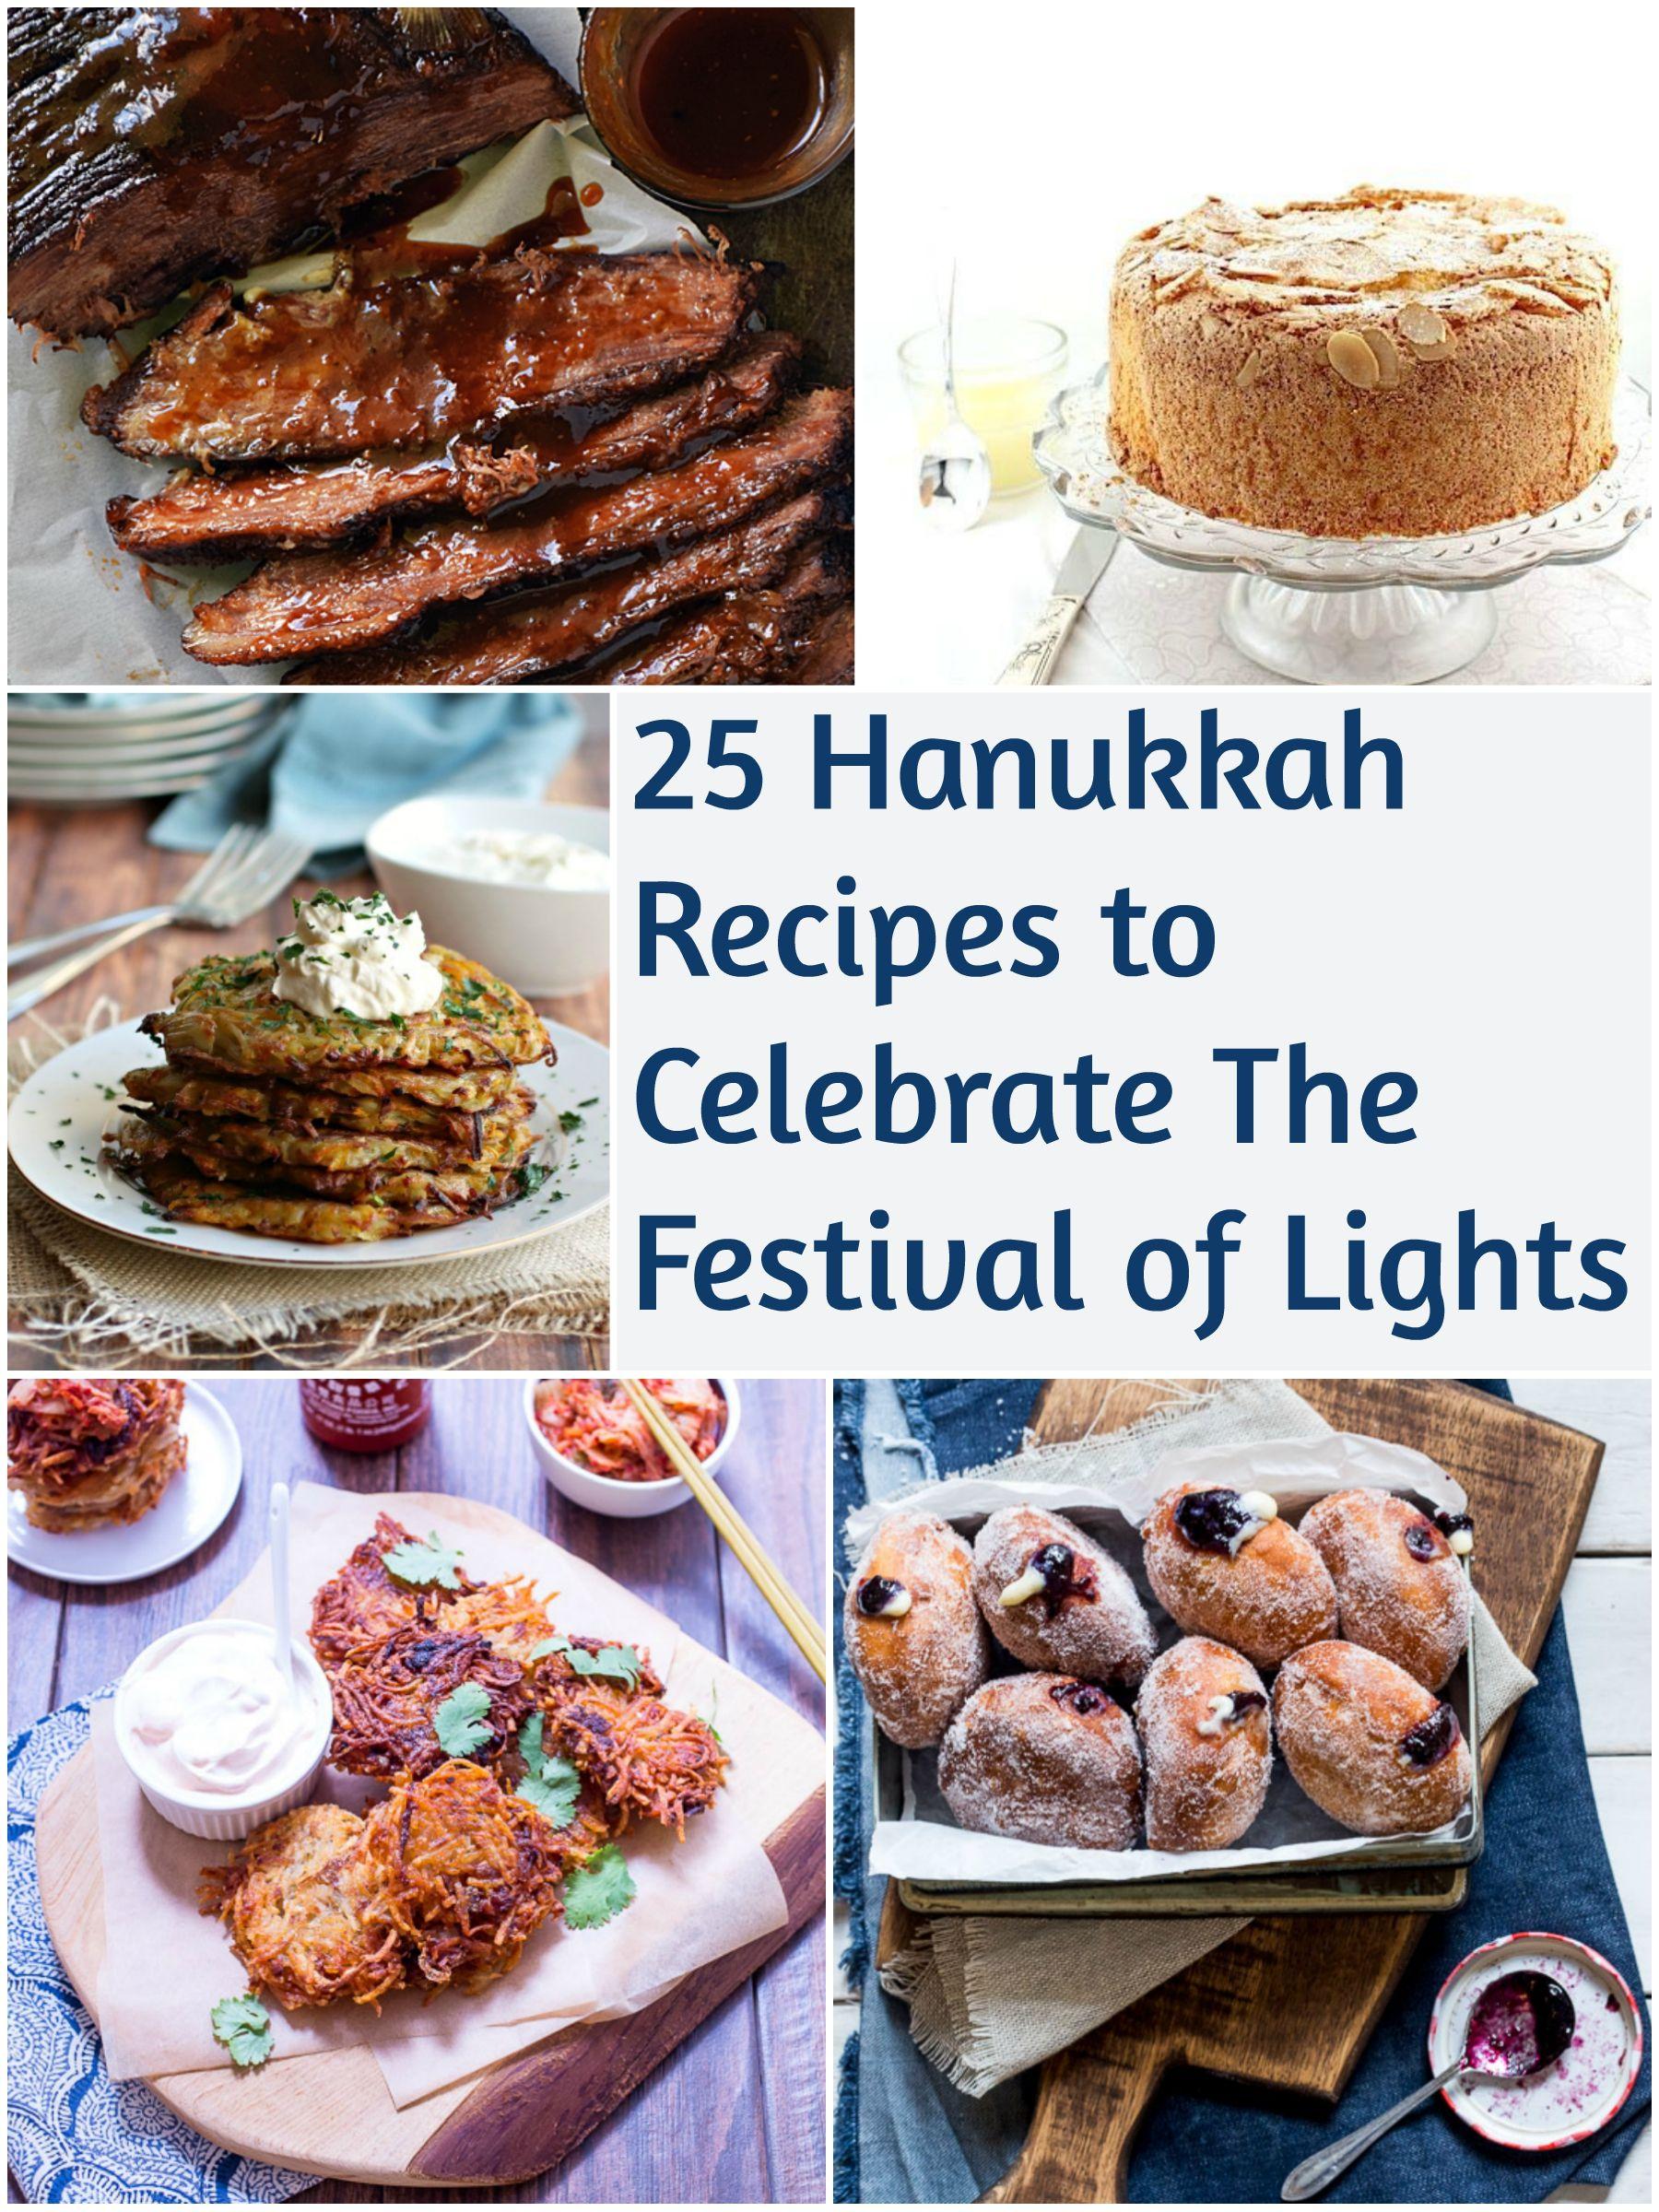 25 Hanukkah Recipes To Celebrate The Festival of Lights